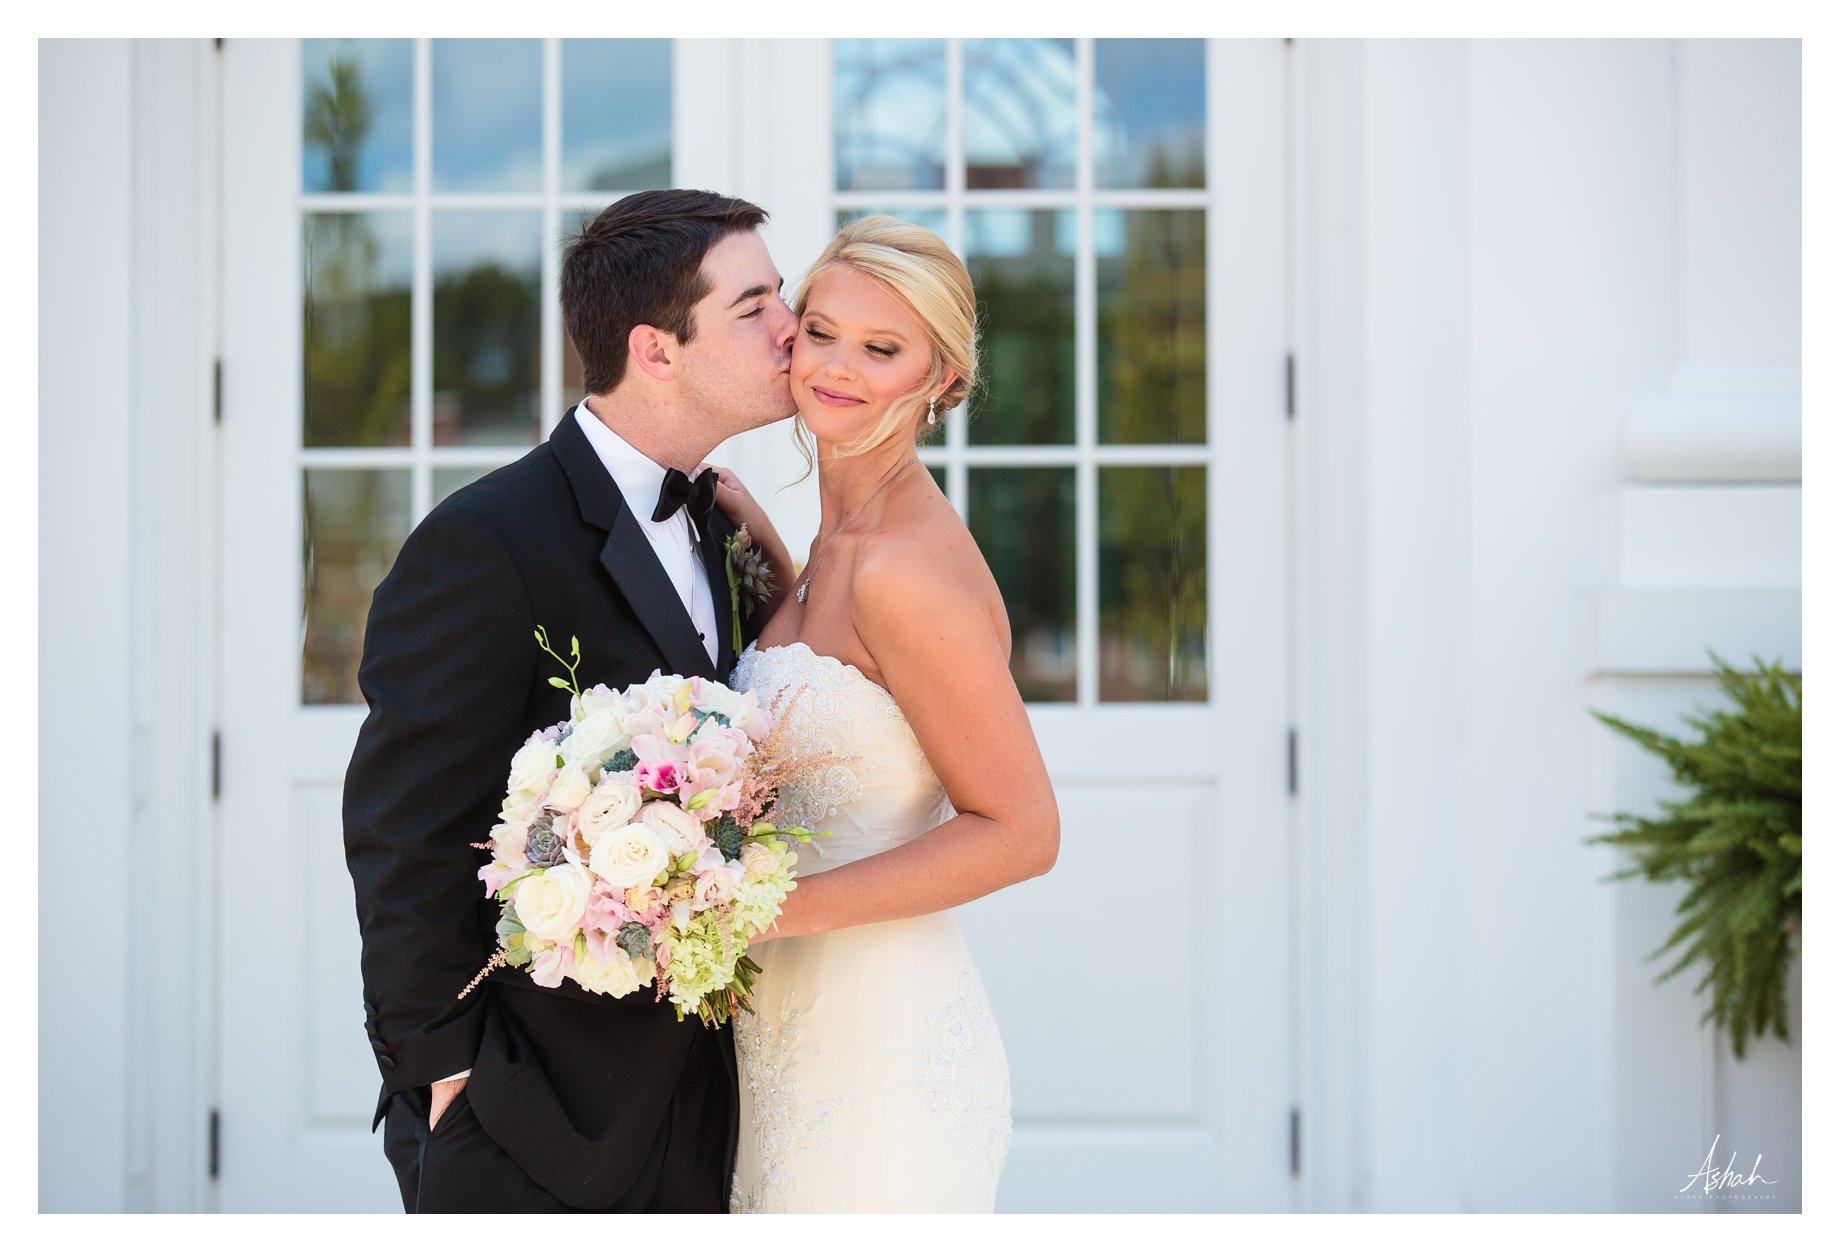 Just a kiss - Macon Wedding Photographer